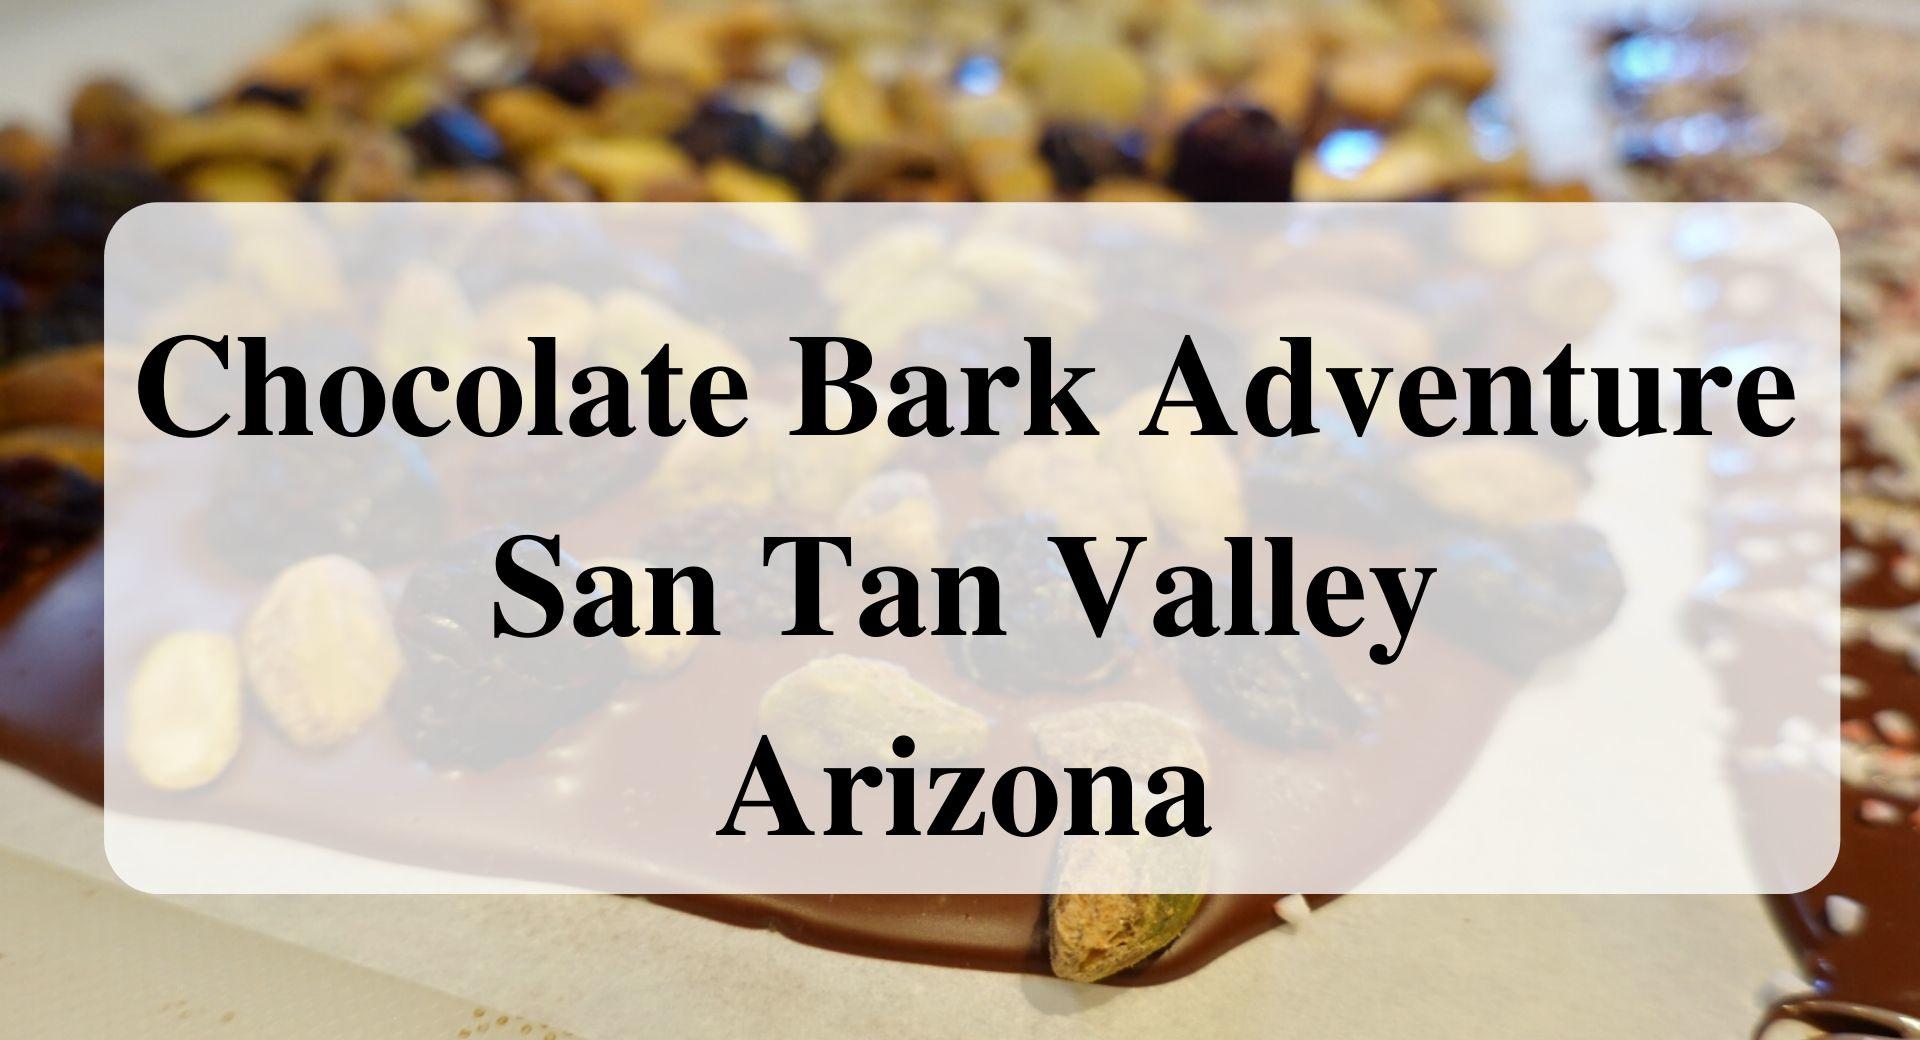 Chocolate Bark Adventure San Tan Valley Arizona Forever sabbatical